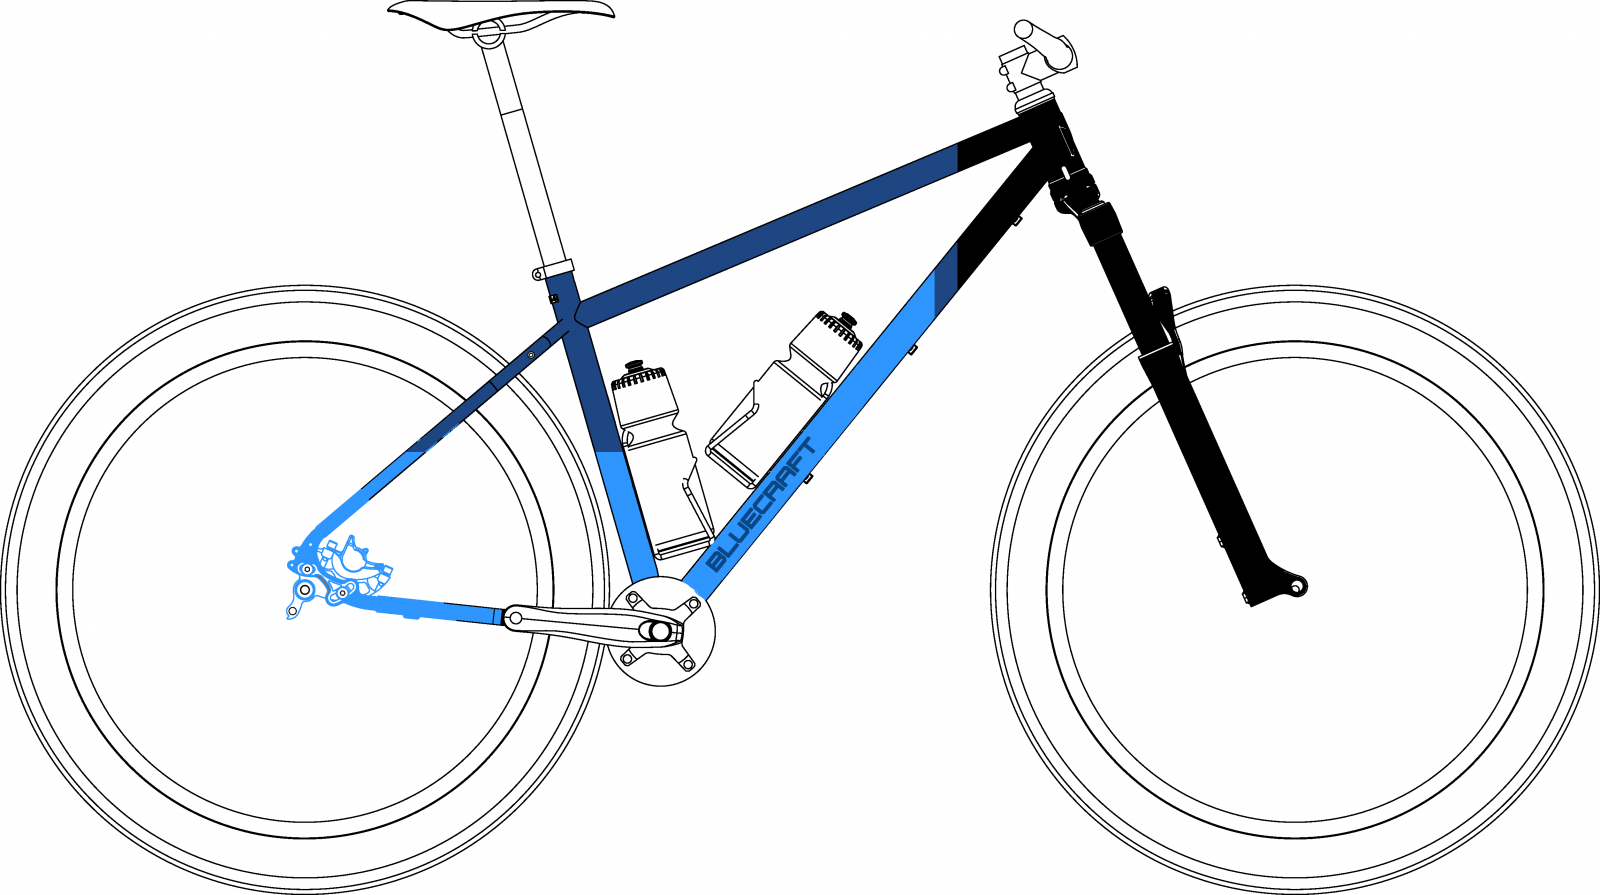 Rahmen MTB für LeDidi - Farbkonzept hellblau.png